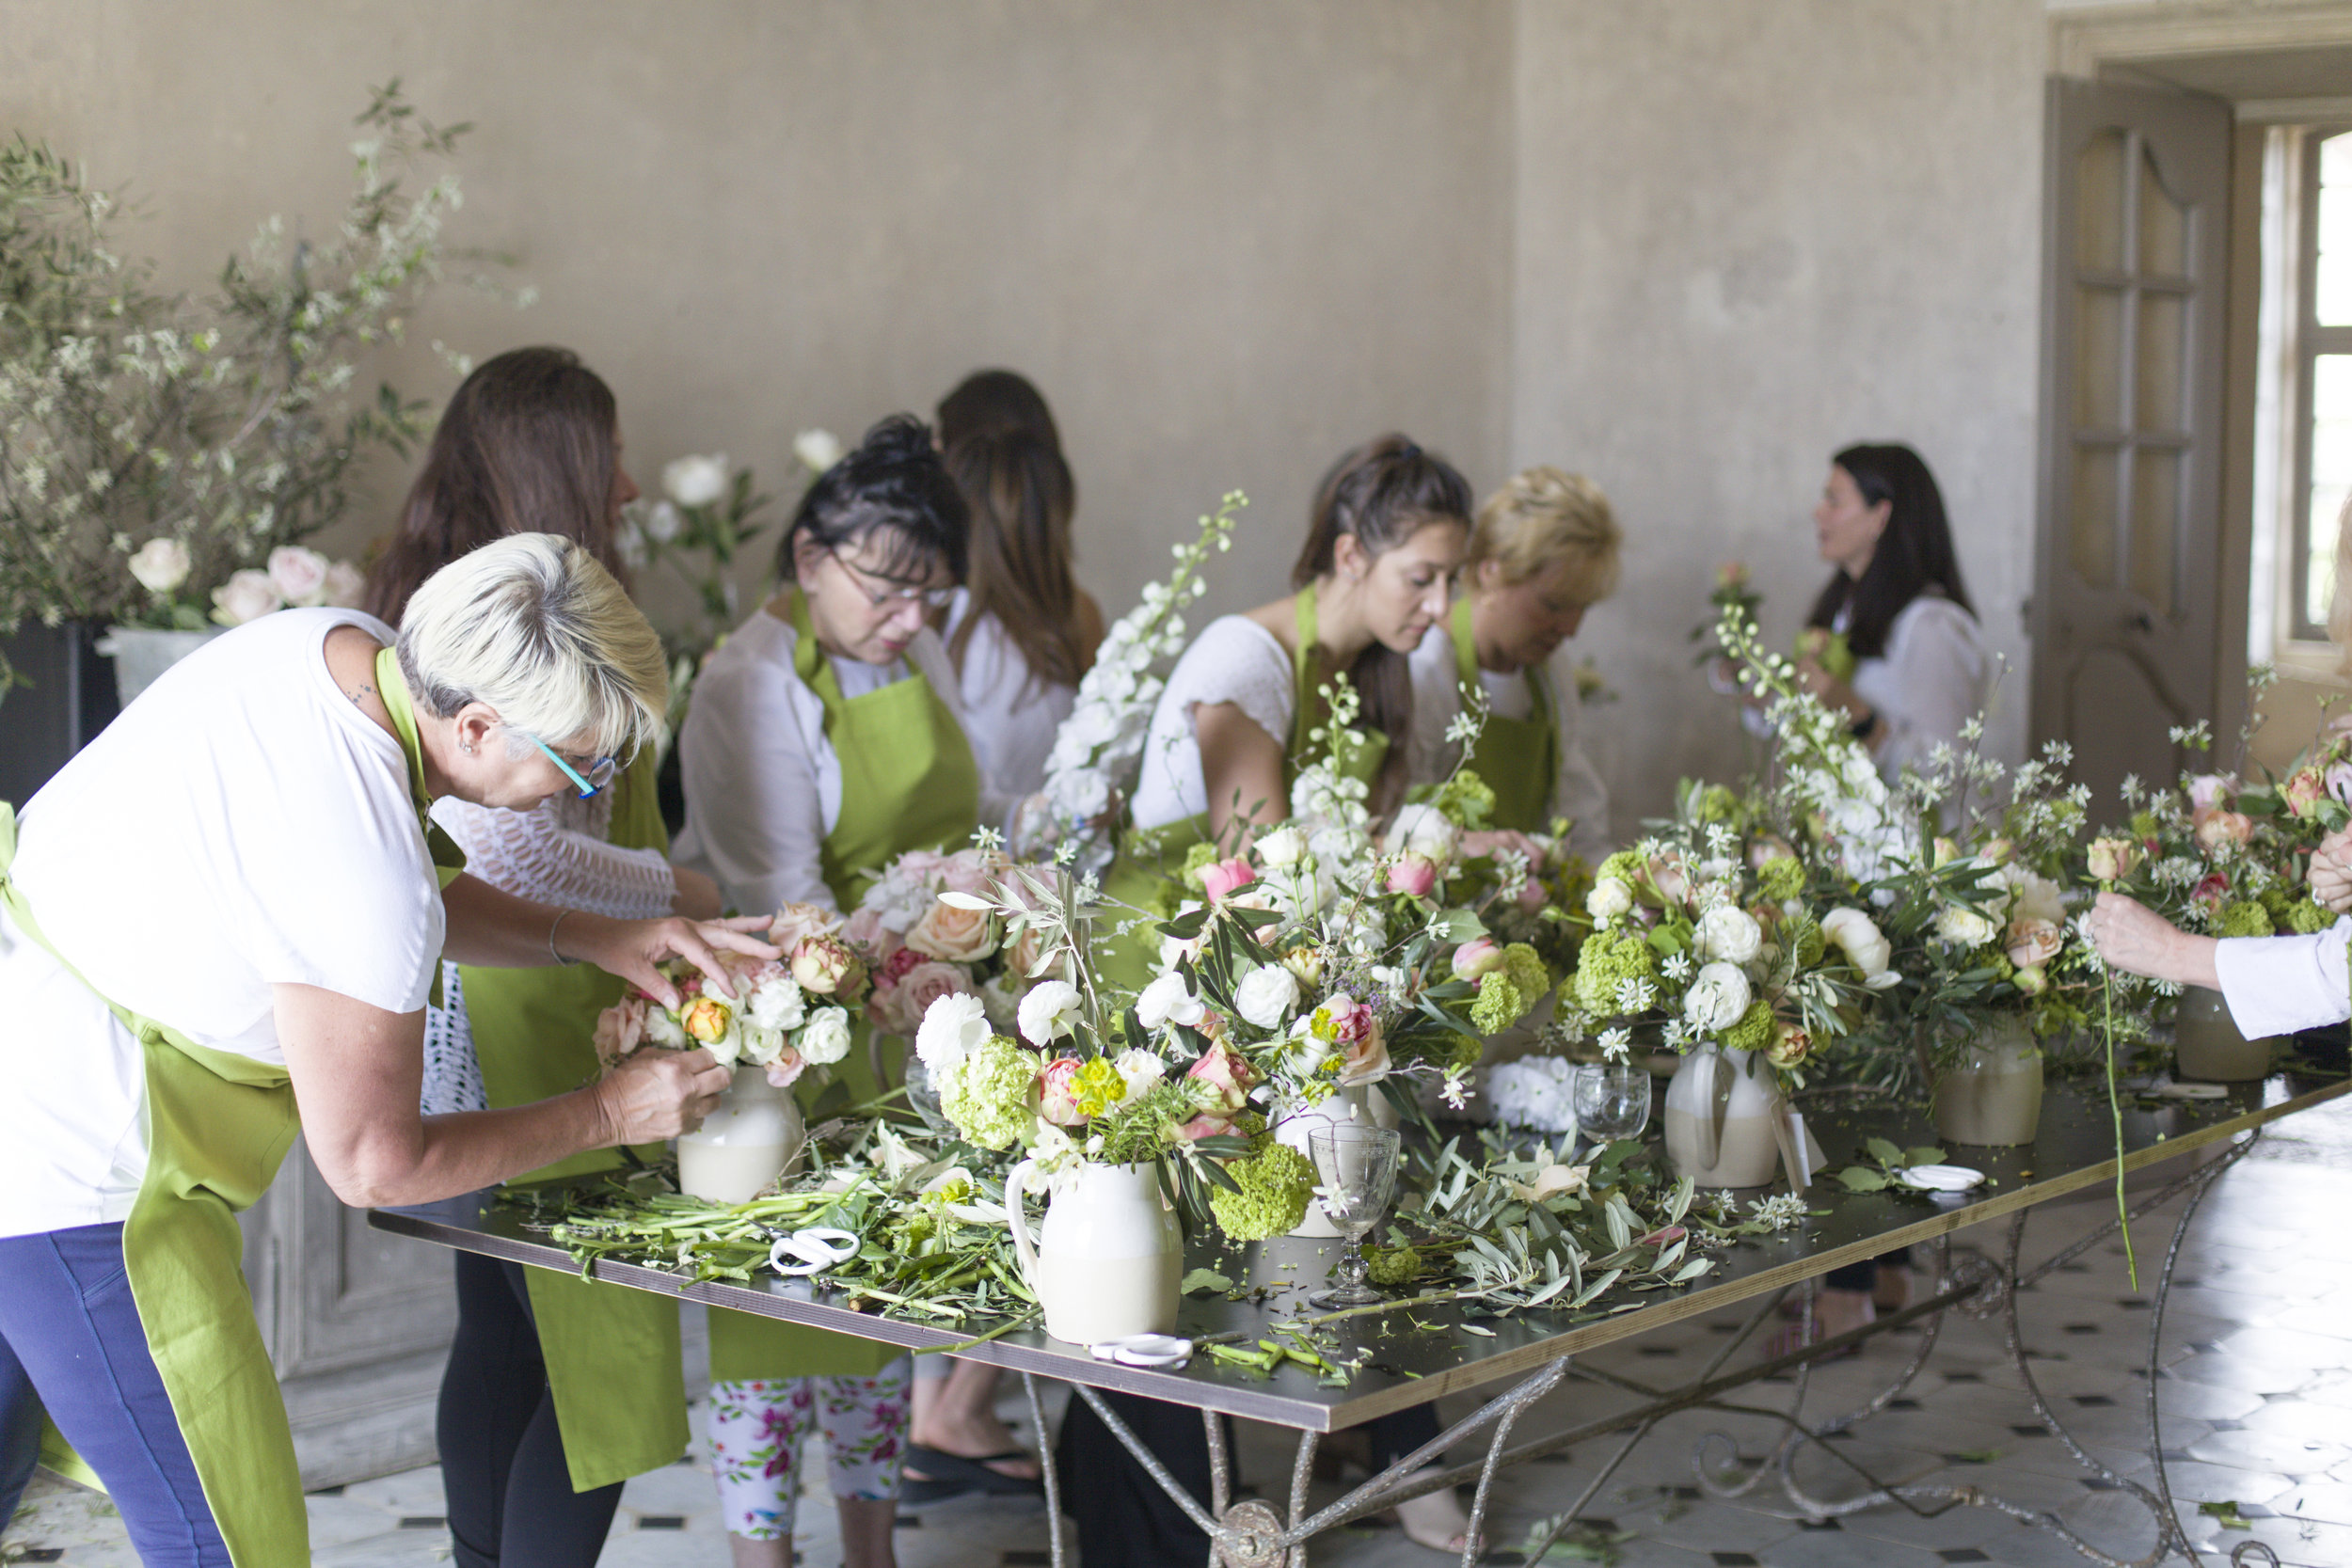 flower arranging class south of france provence chateau lesfleurs sandra sigman group floral workshop